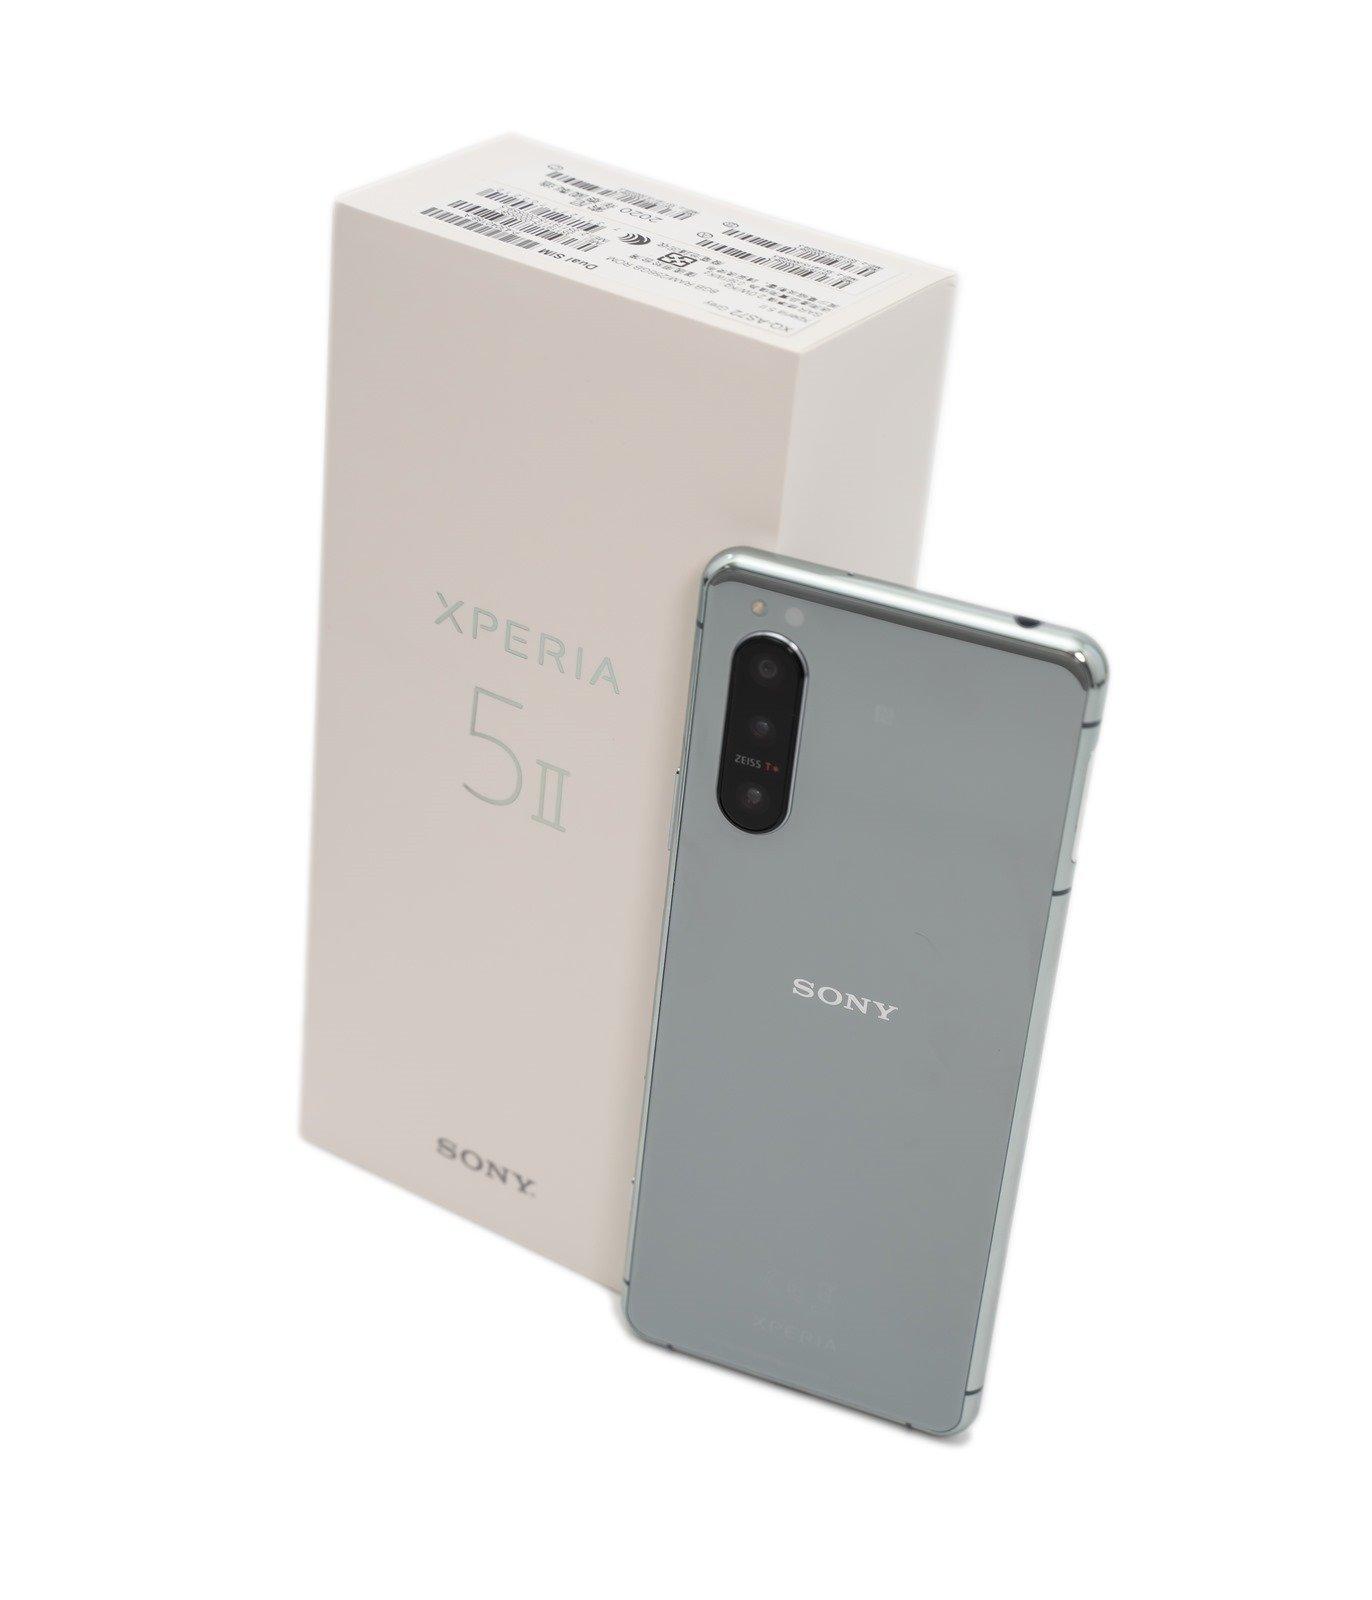 Sony Xperia 5 II 簡單開箱 / 性能測試 / 電力續航 / 相機實拍分享 (1) @3C 達人廖阿輝